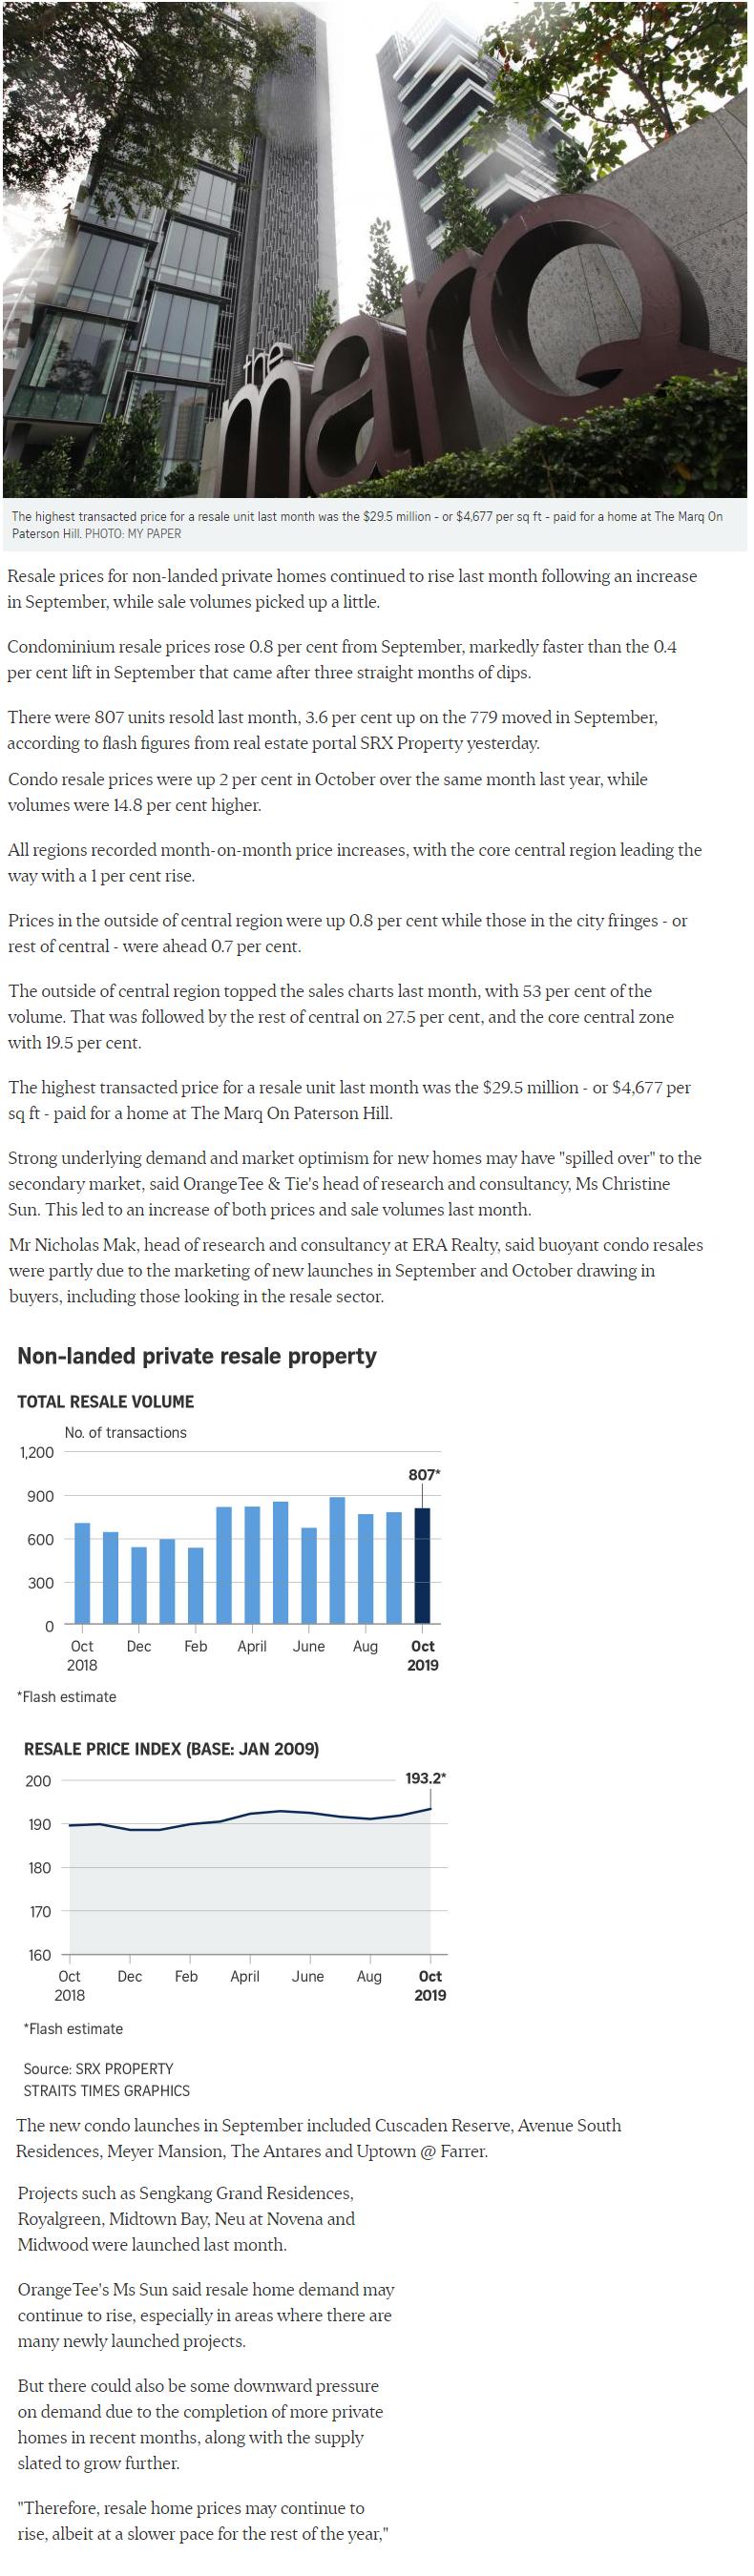 Singapore Condo Resale Prices Up 0.8% Last Month